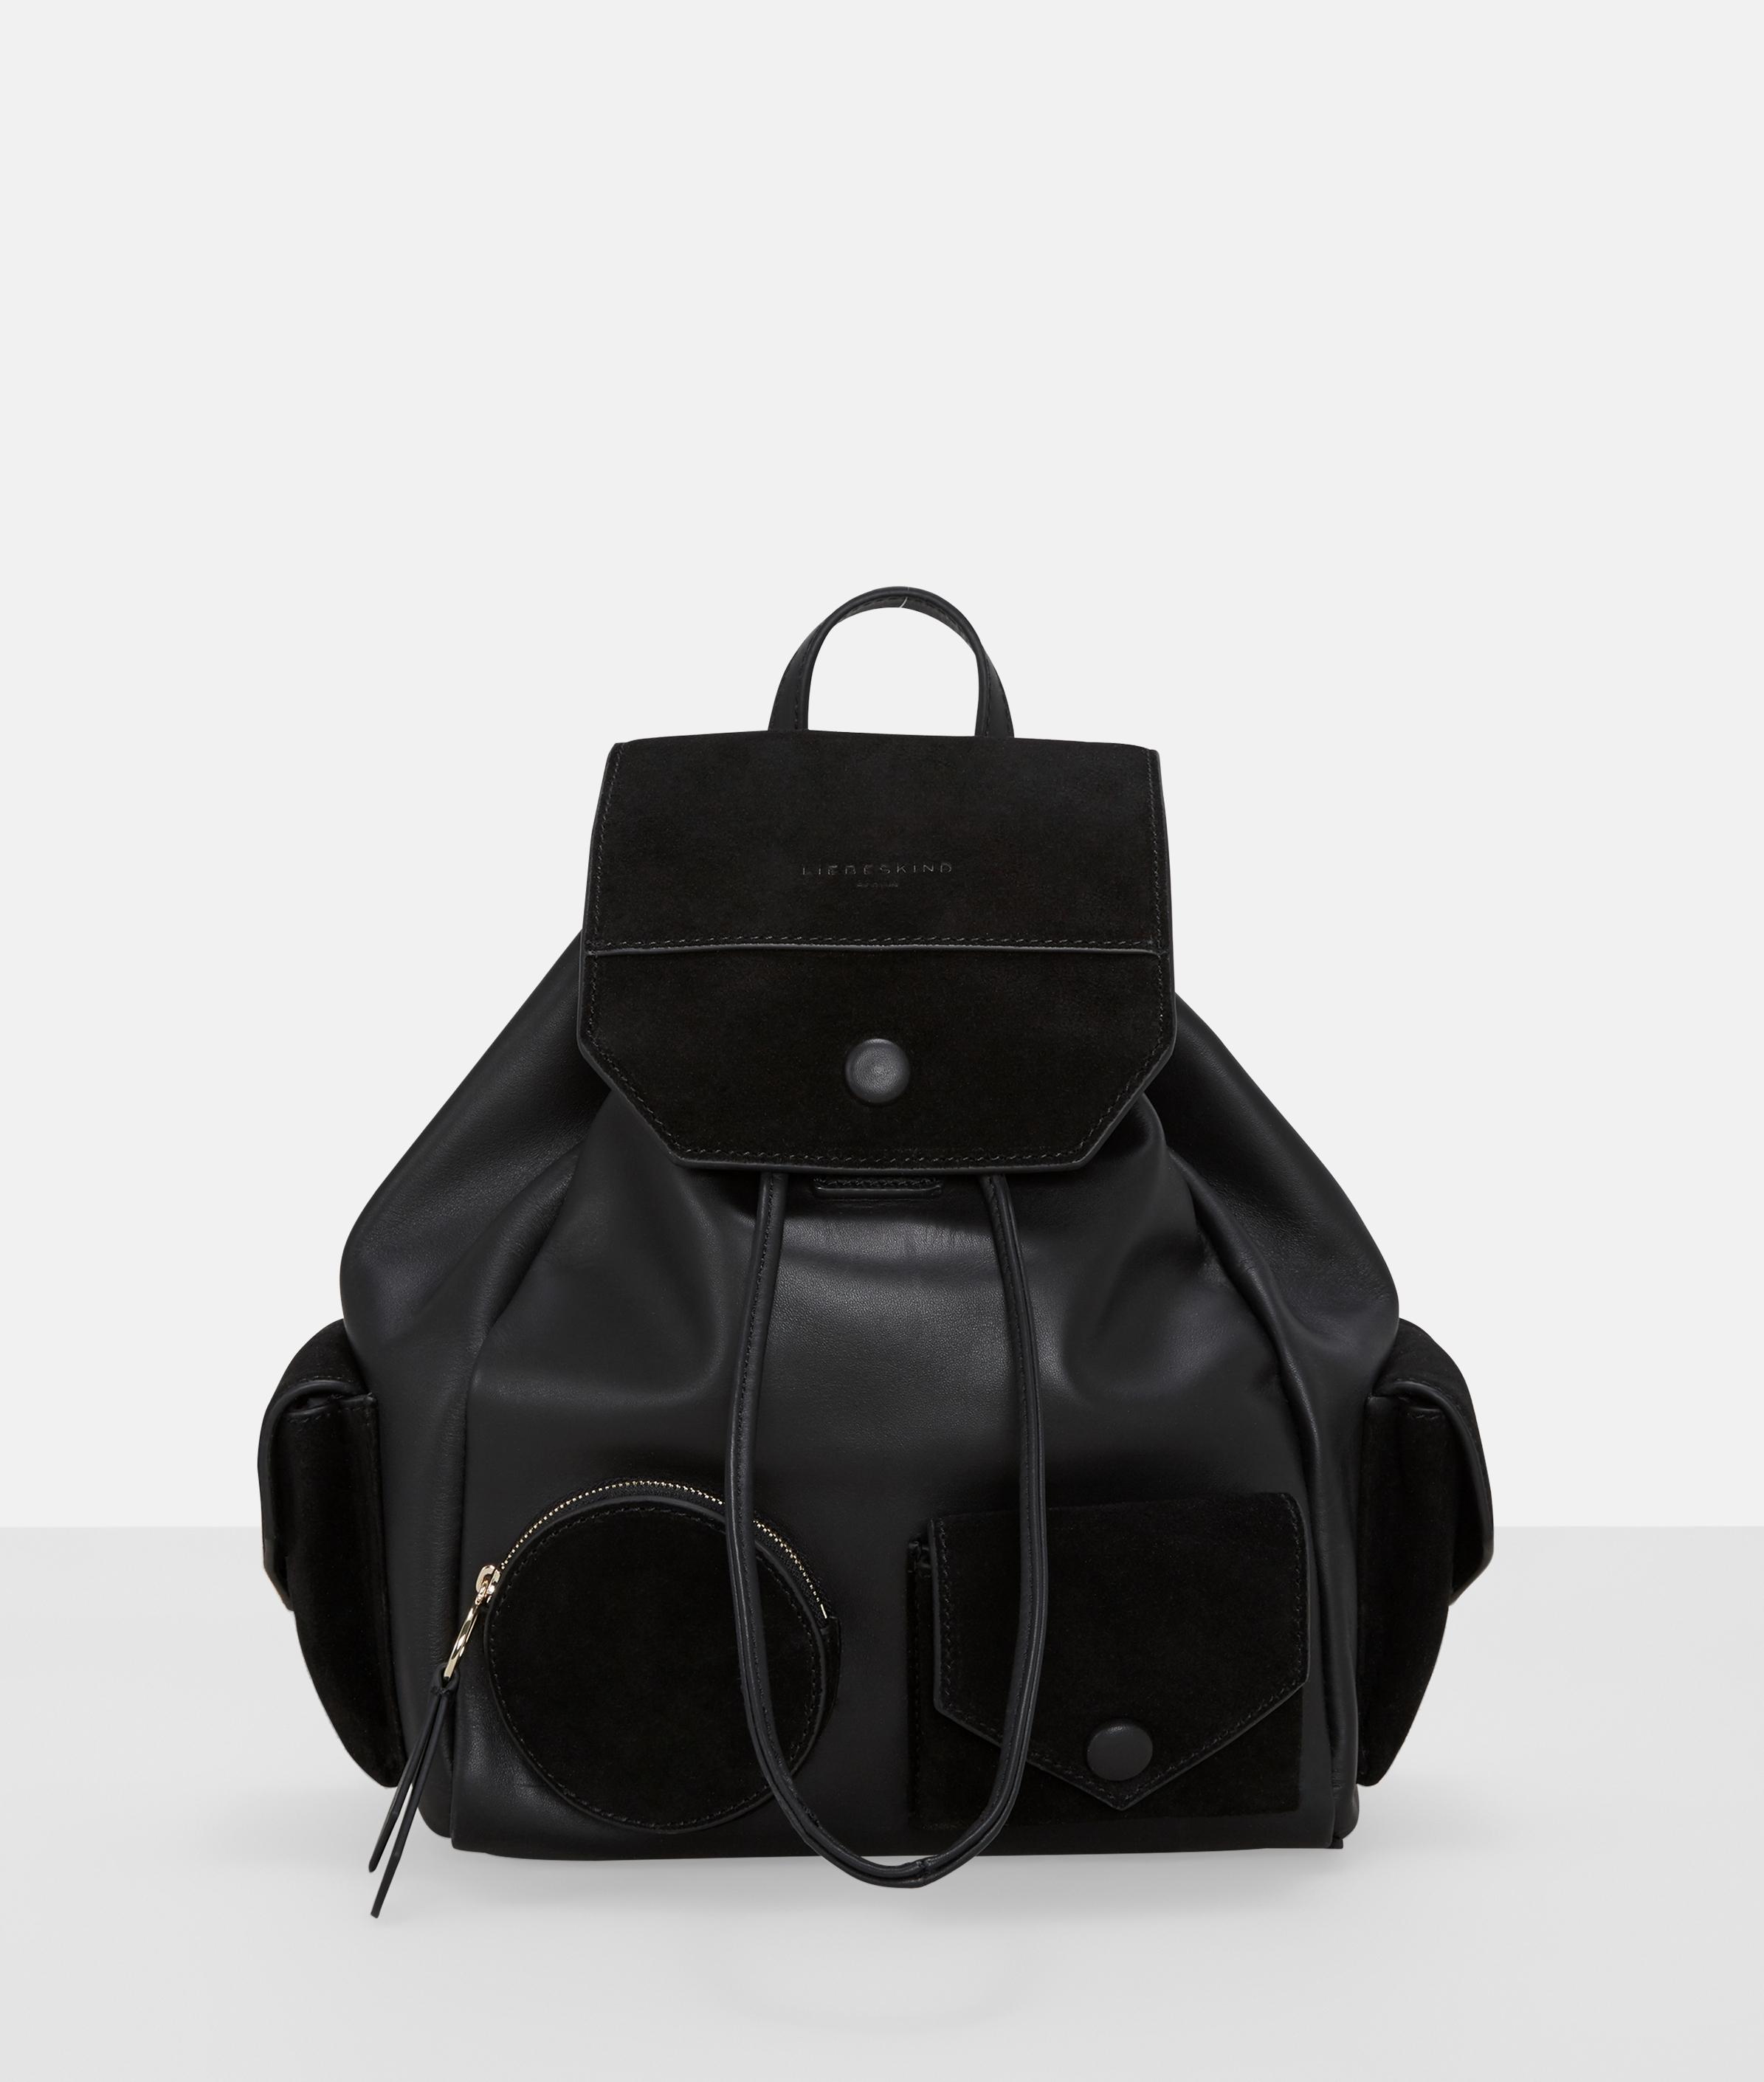 Berlin Tasche Casual Pocket Backpack M, Grau/Schwarz